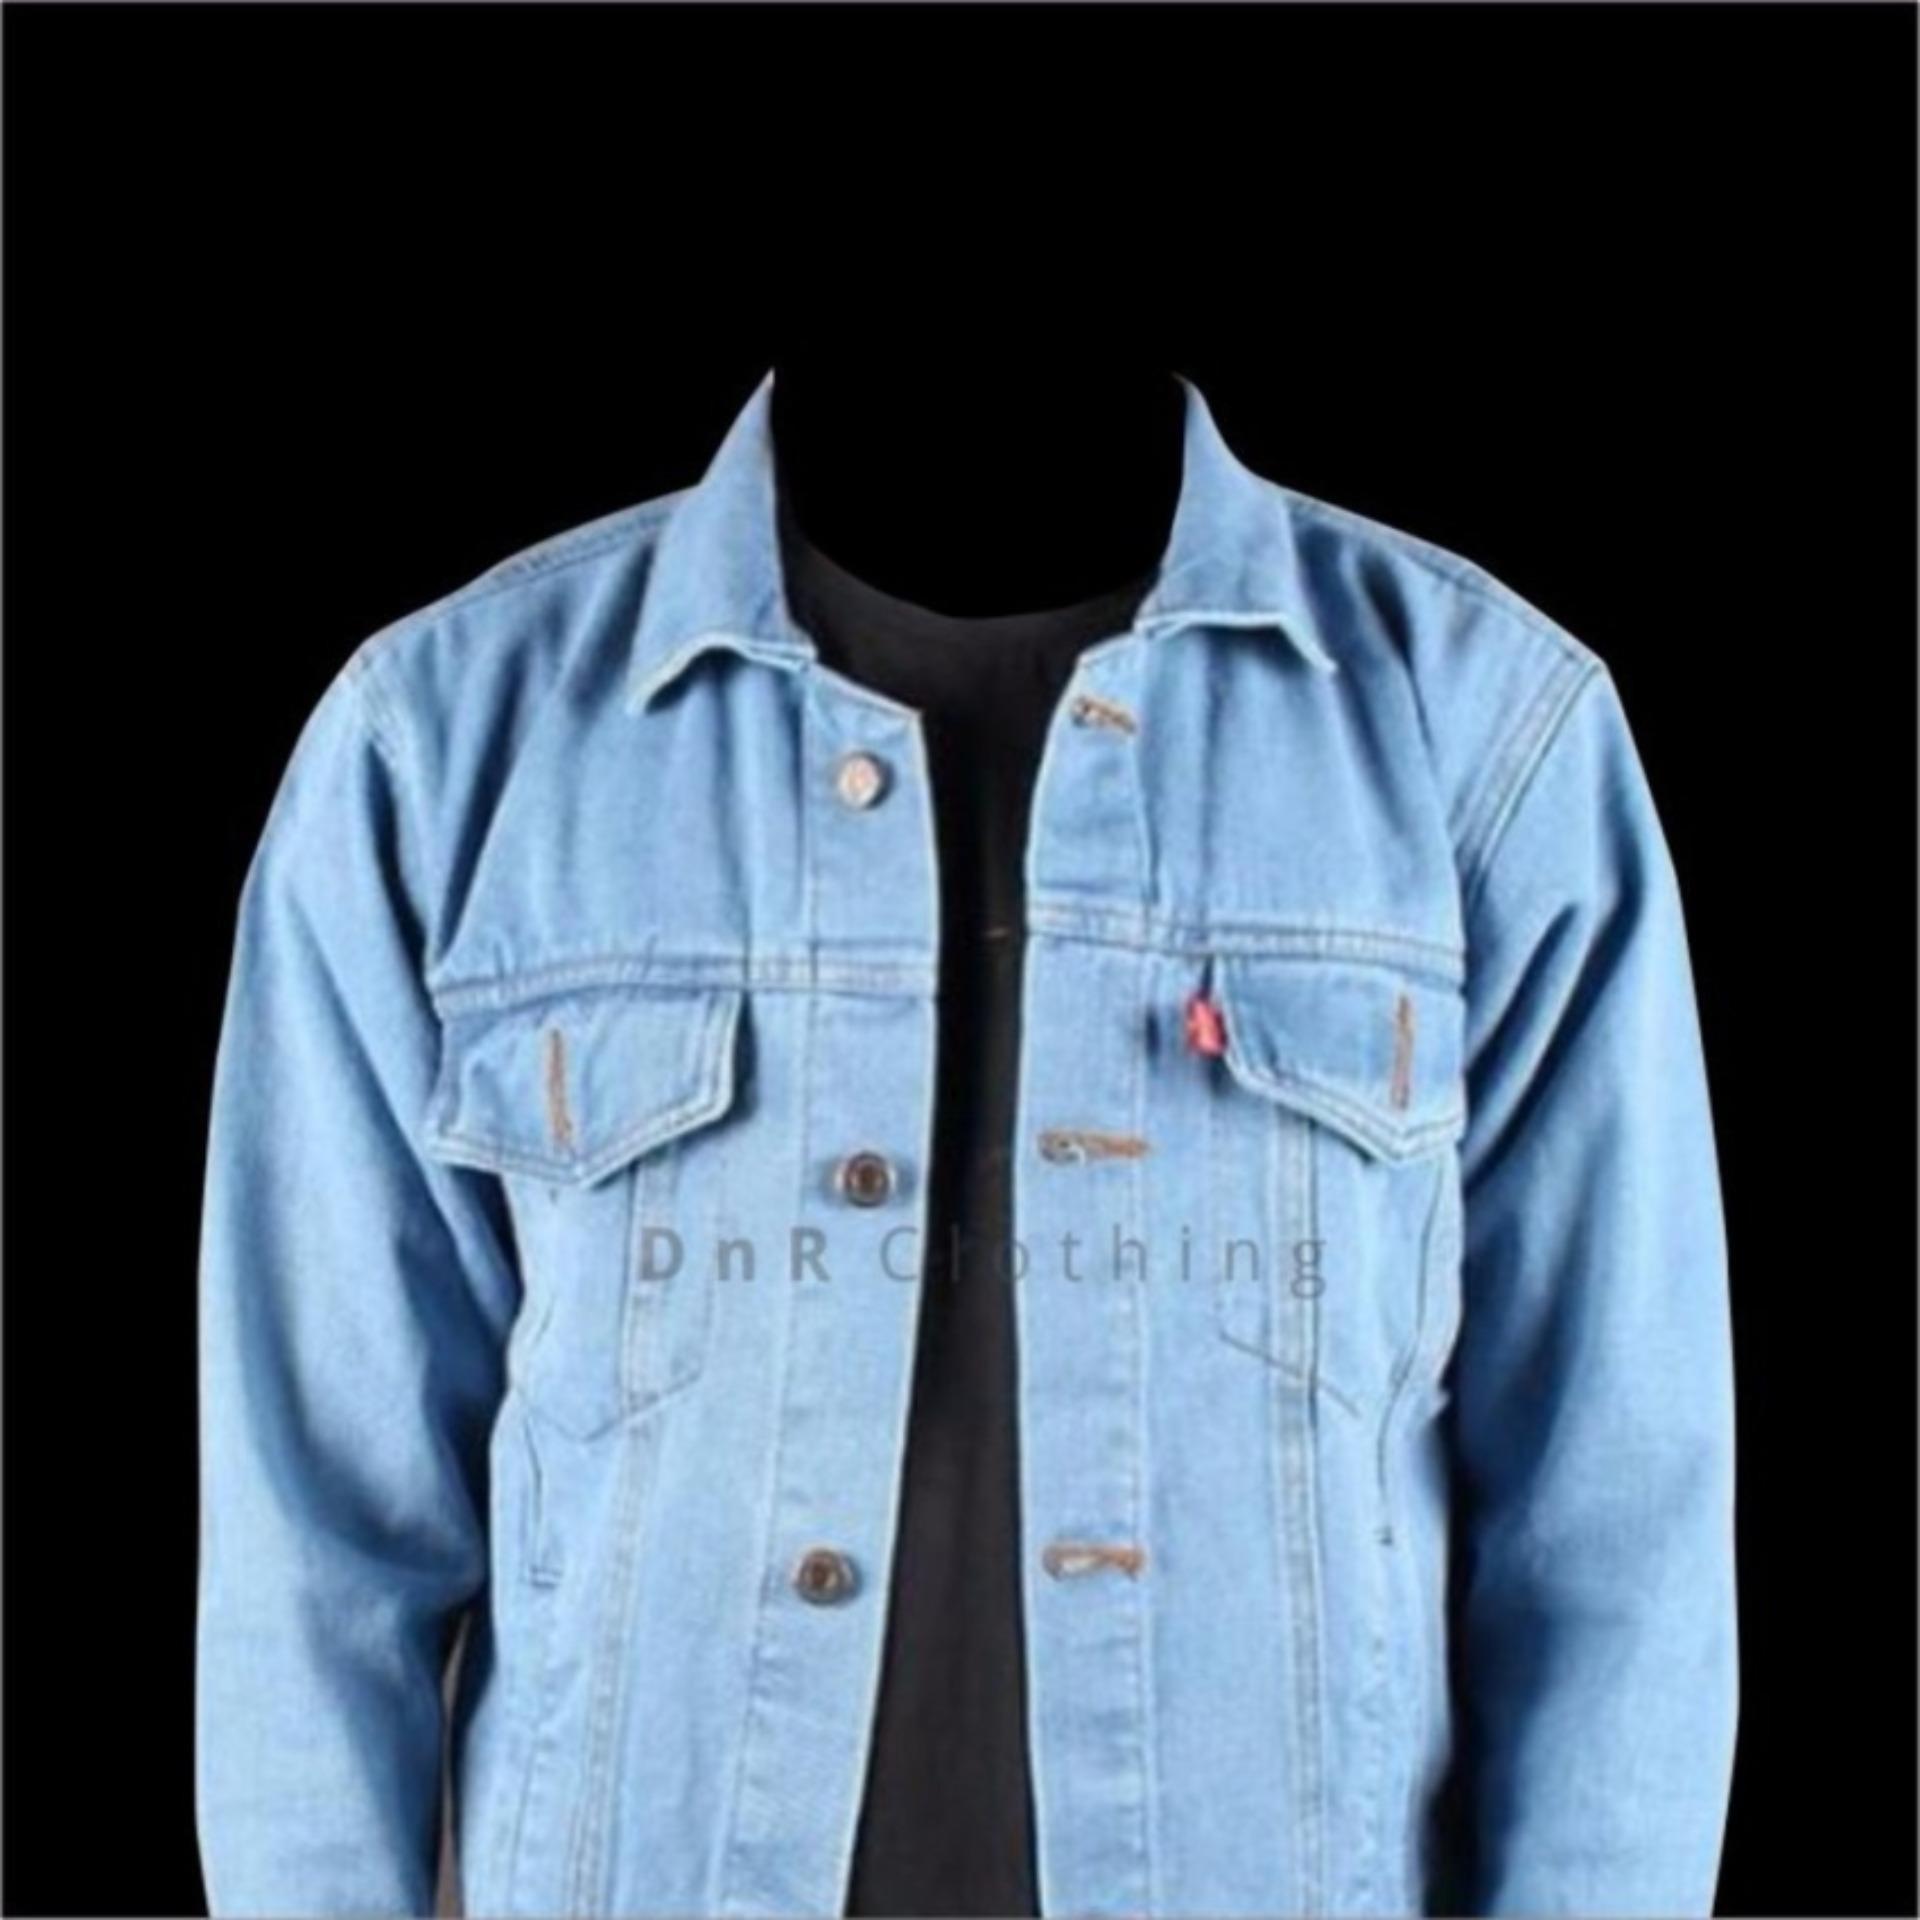 Pops Jaket Jeans Denim Pria Premium Biru Terang Daftar Harga Jean Tua Jak 2044 Light Blue Bioblits